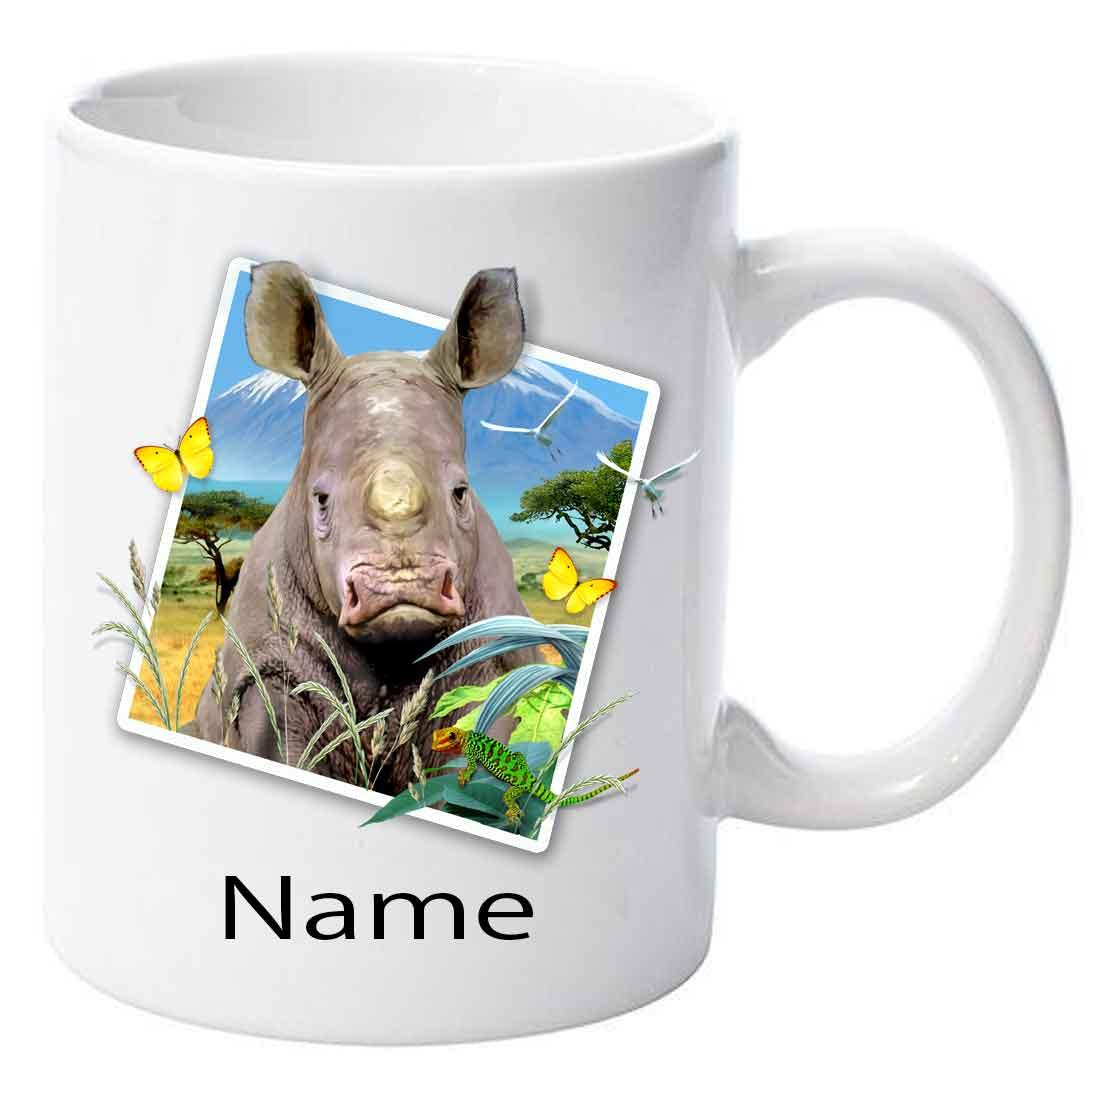 Personalised Rhino 1 Selfie Ceramic Mug